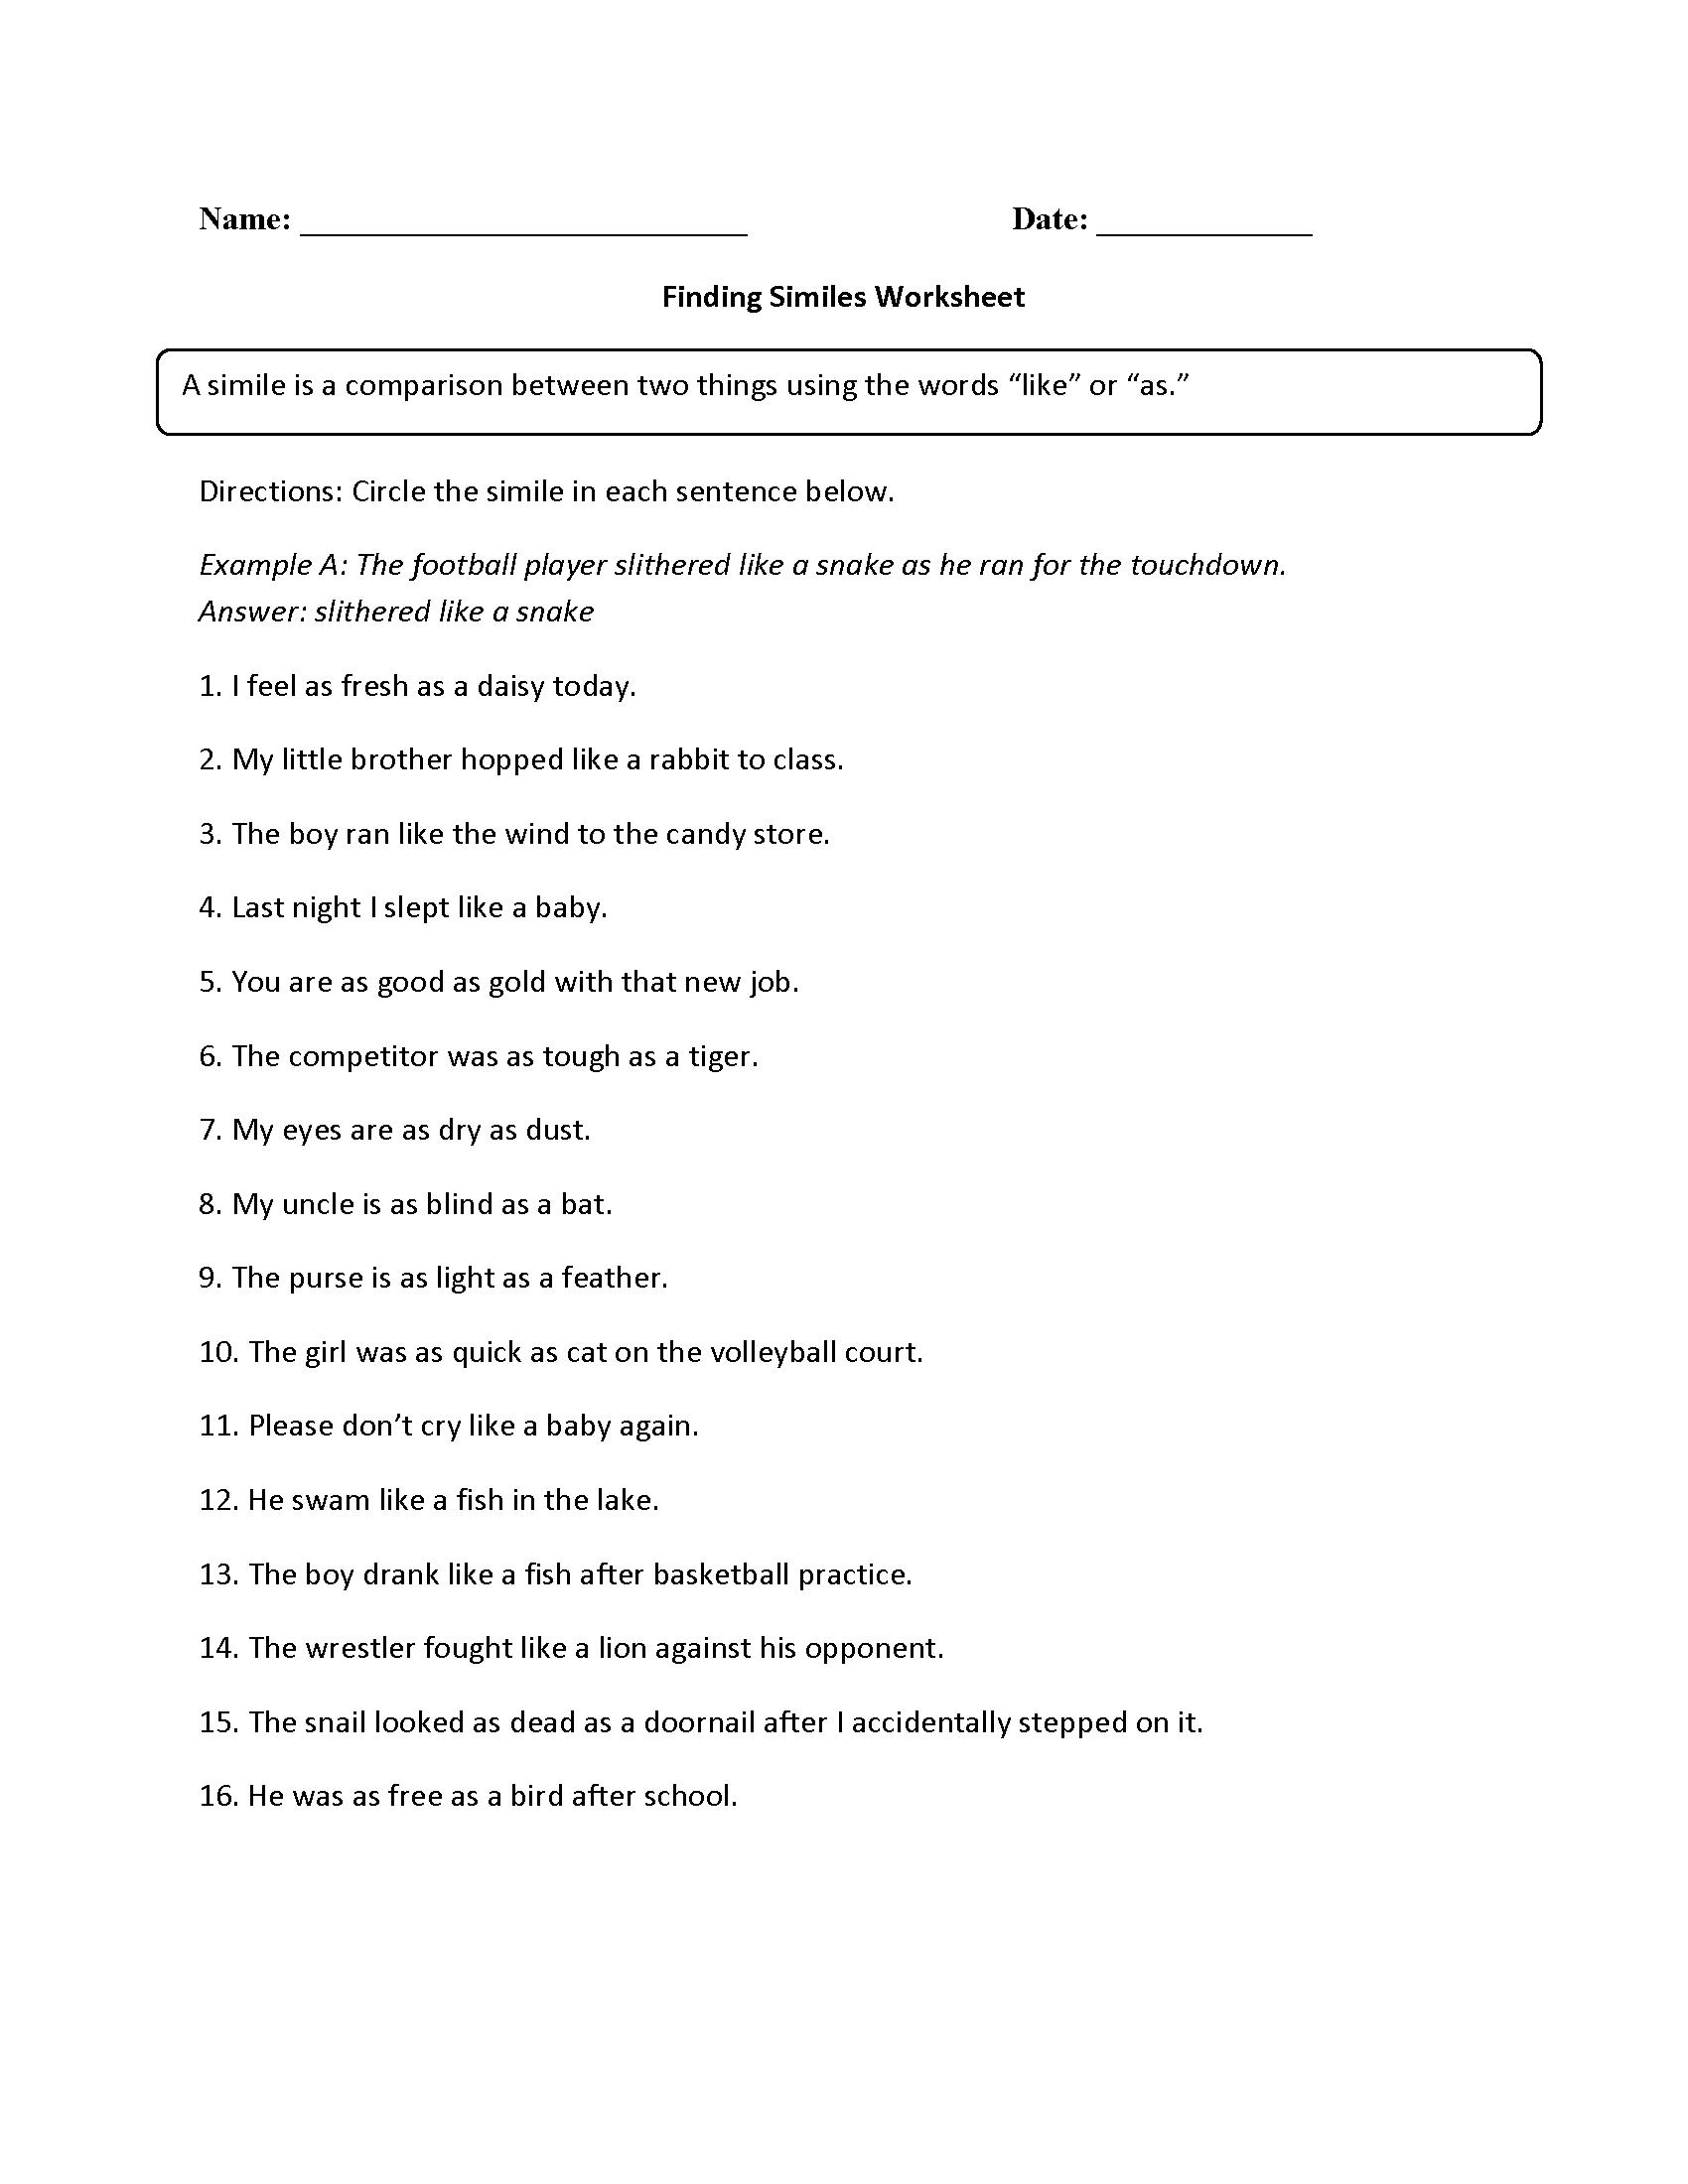 Finding Similes Worksheet